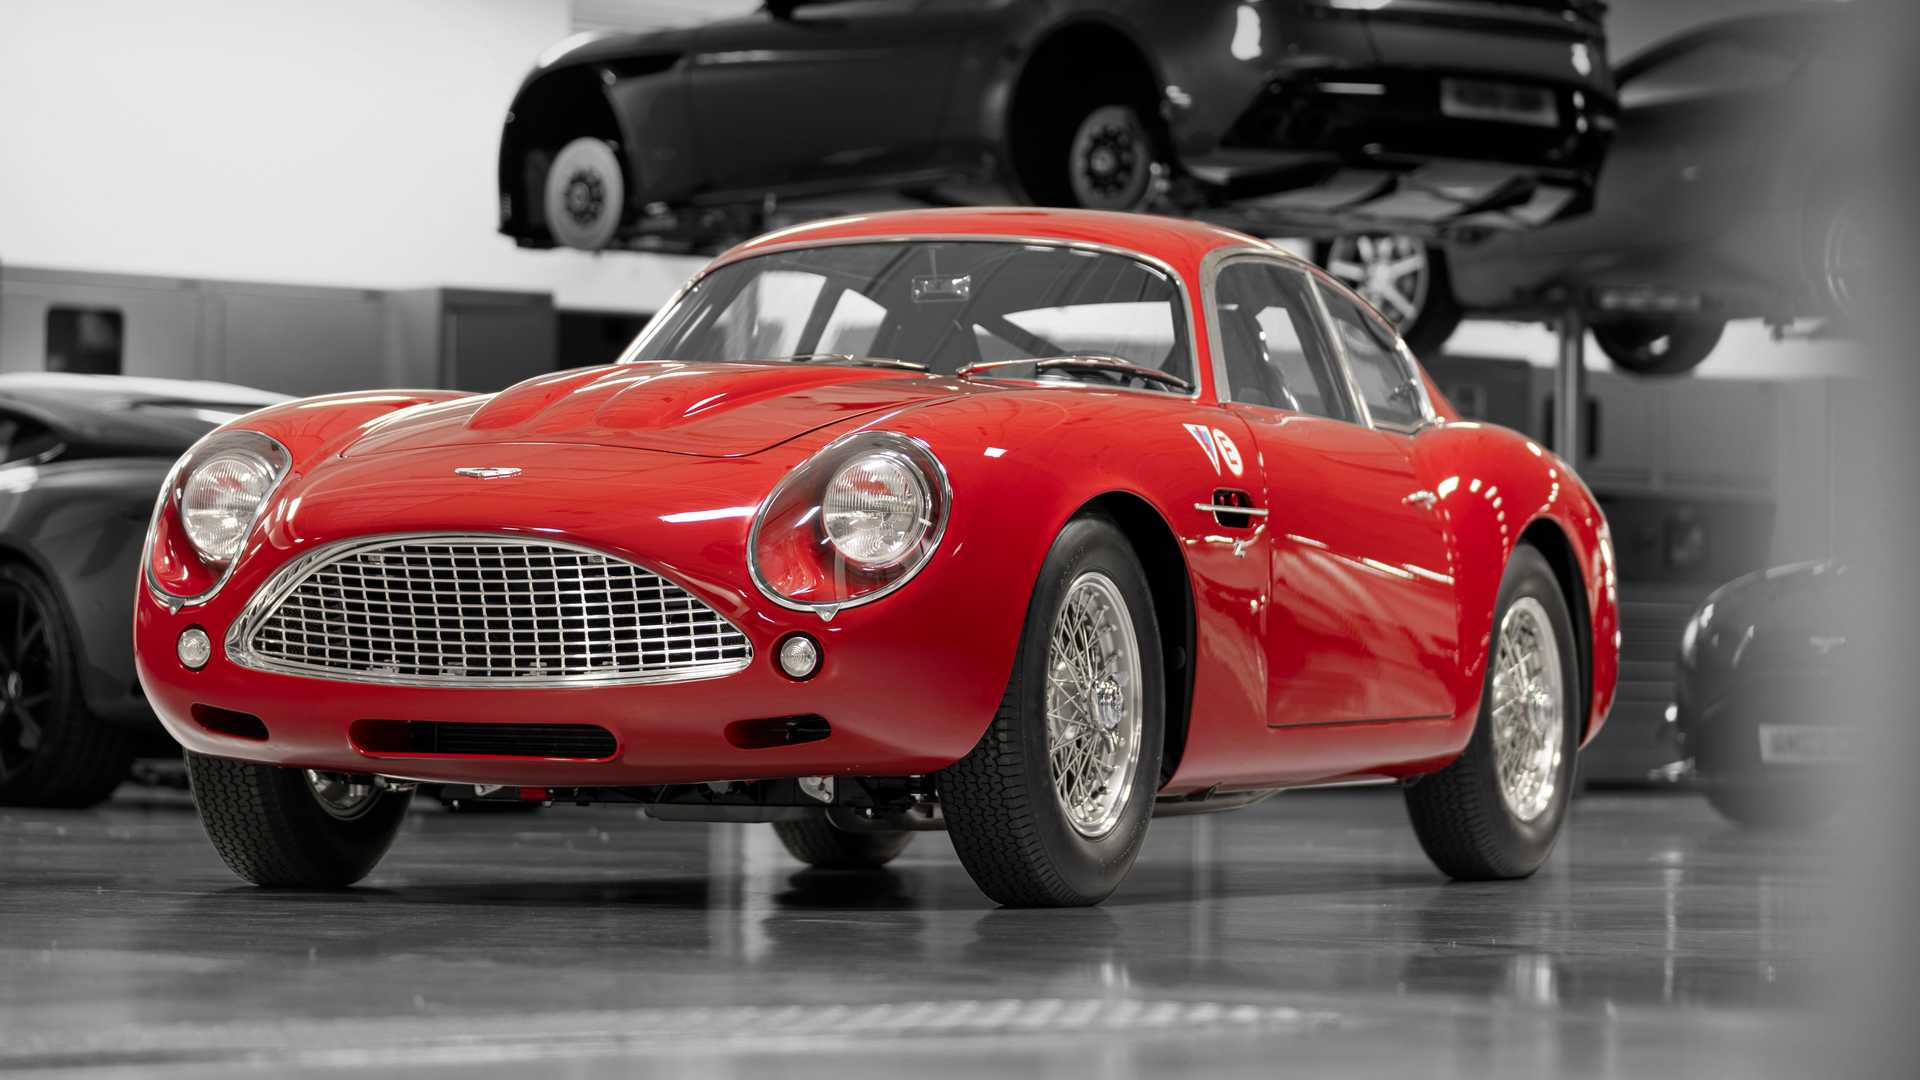 Первые фото ретро-спорткара Aston Martin за $7,5 миллиона